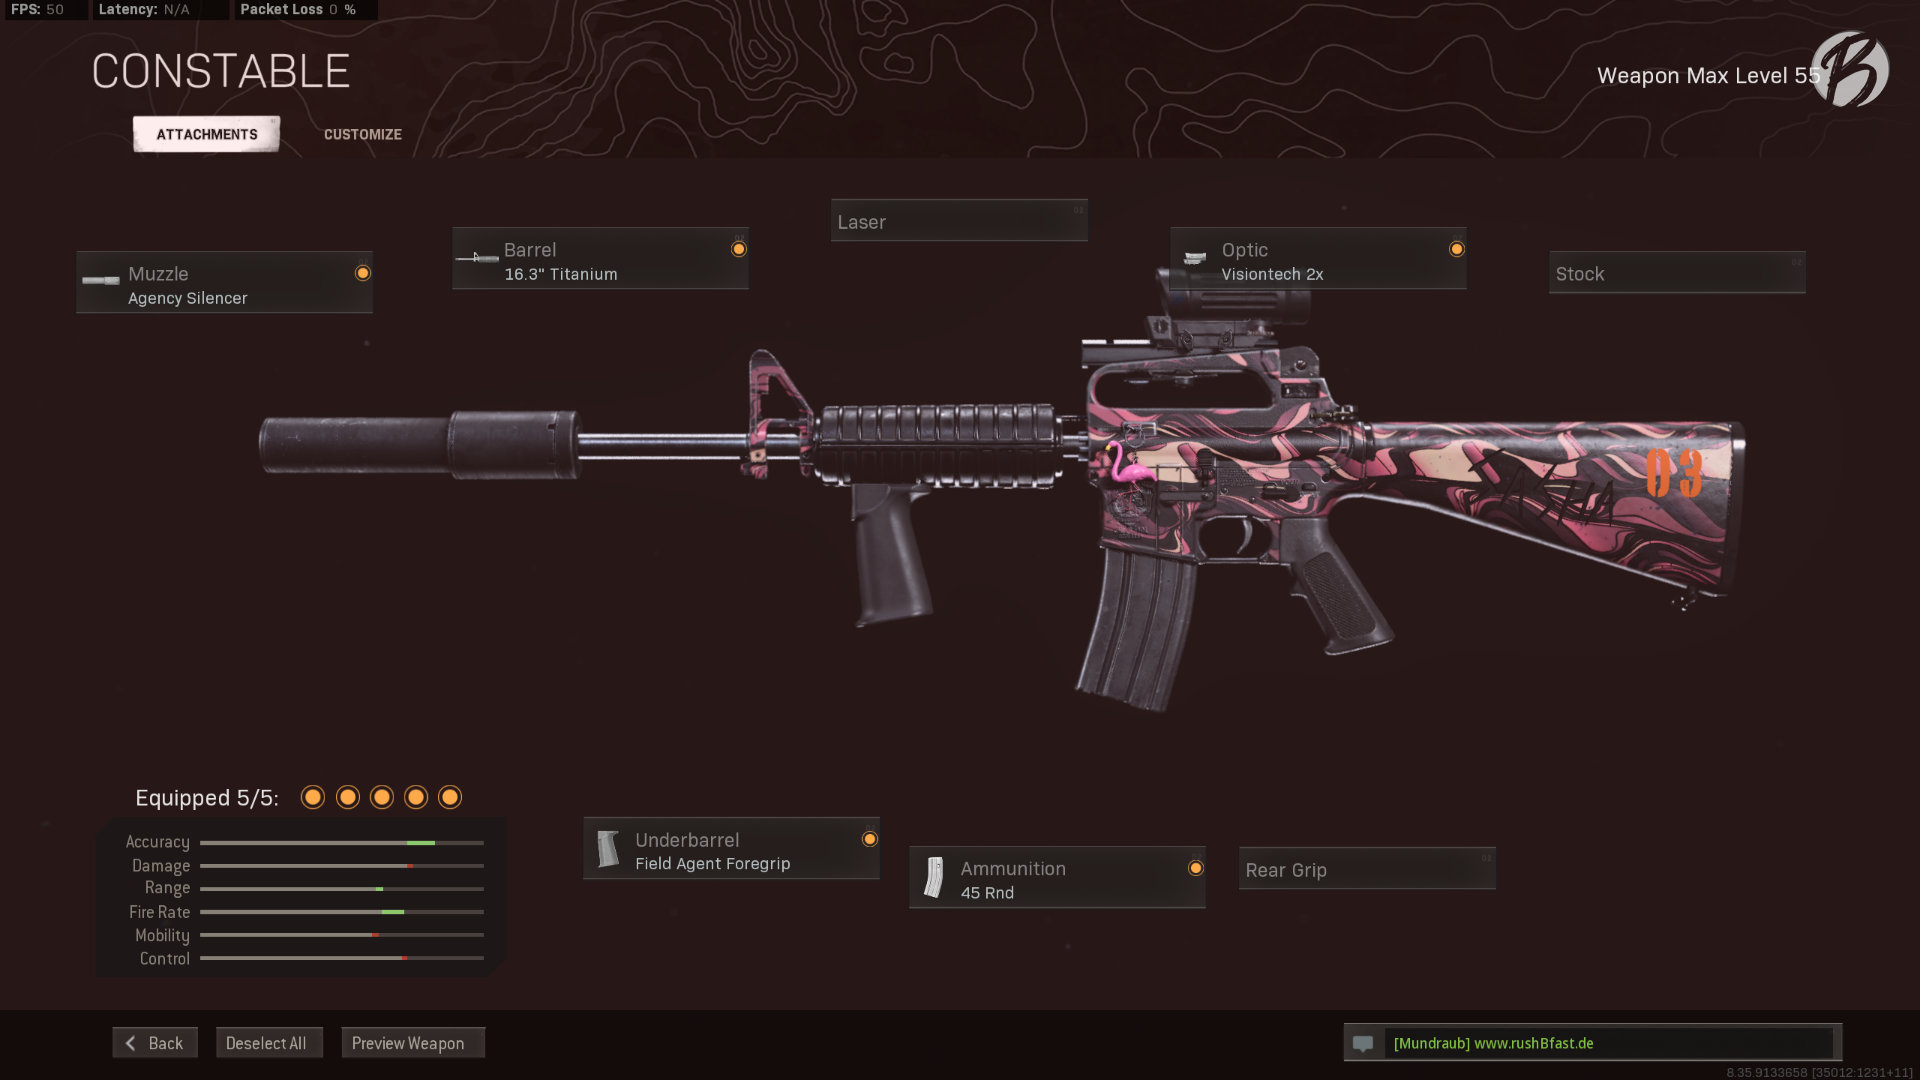 Call of Duty Warzone - Cold War Season 3 - M16